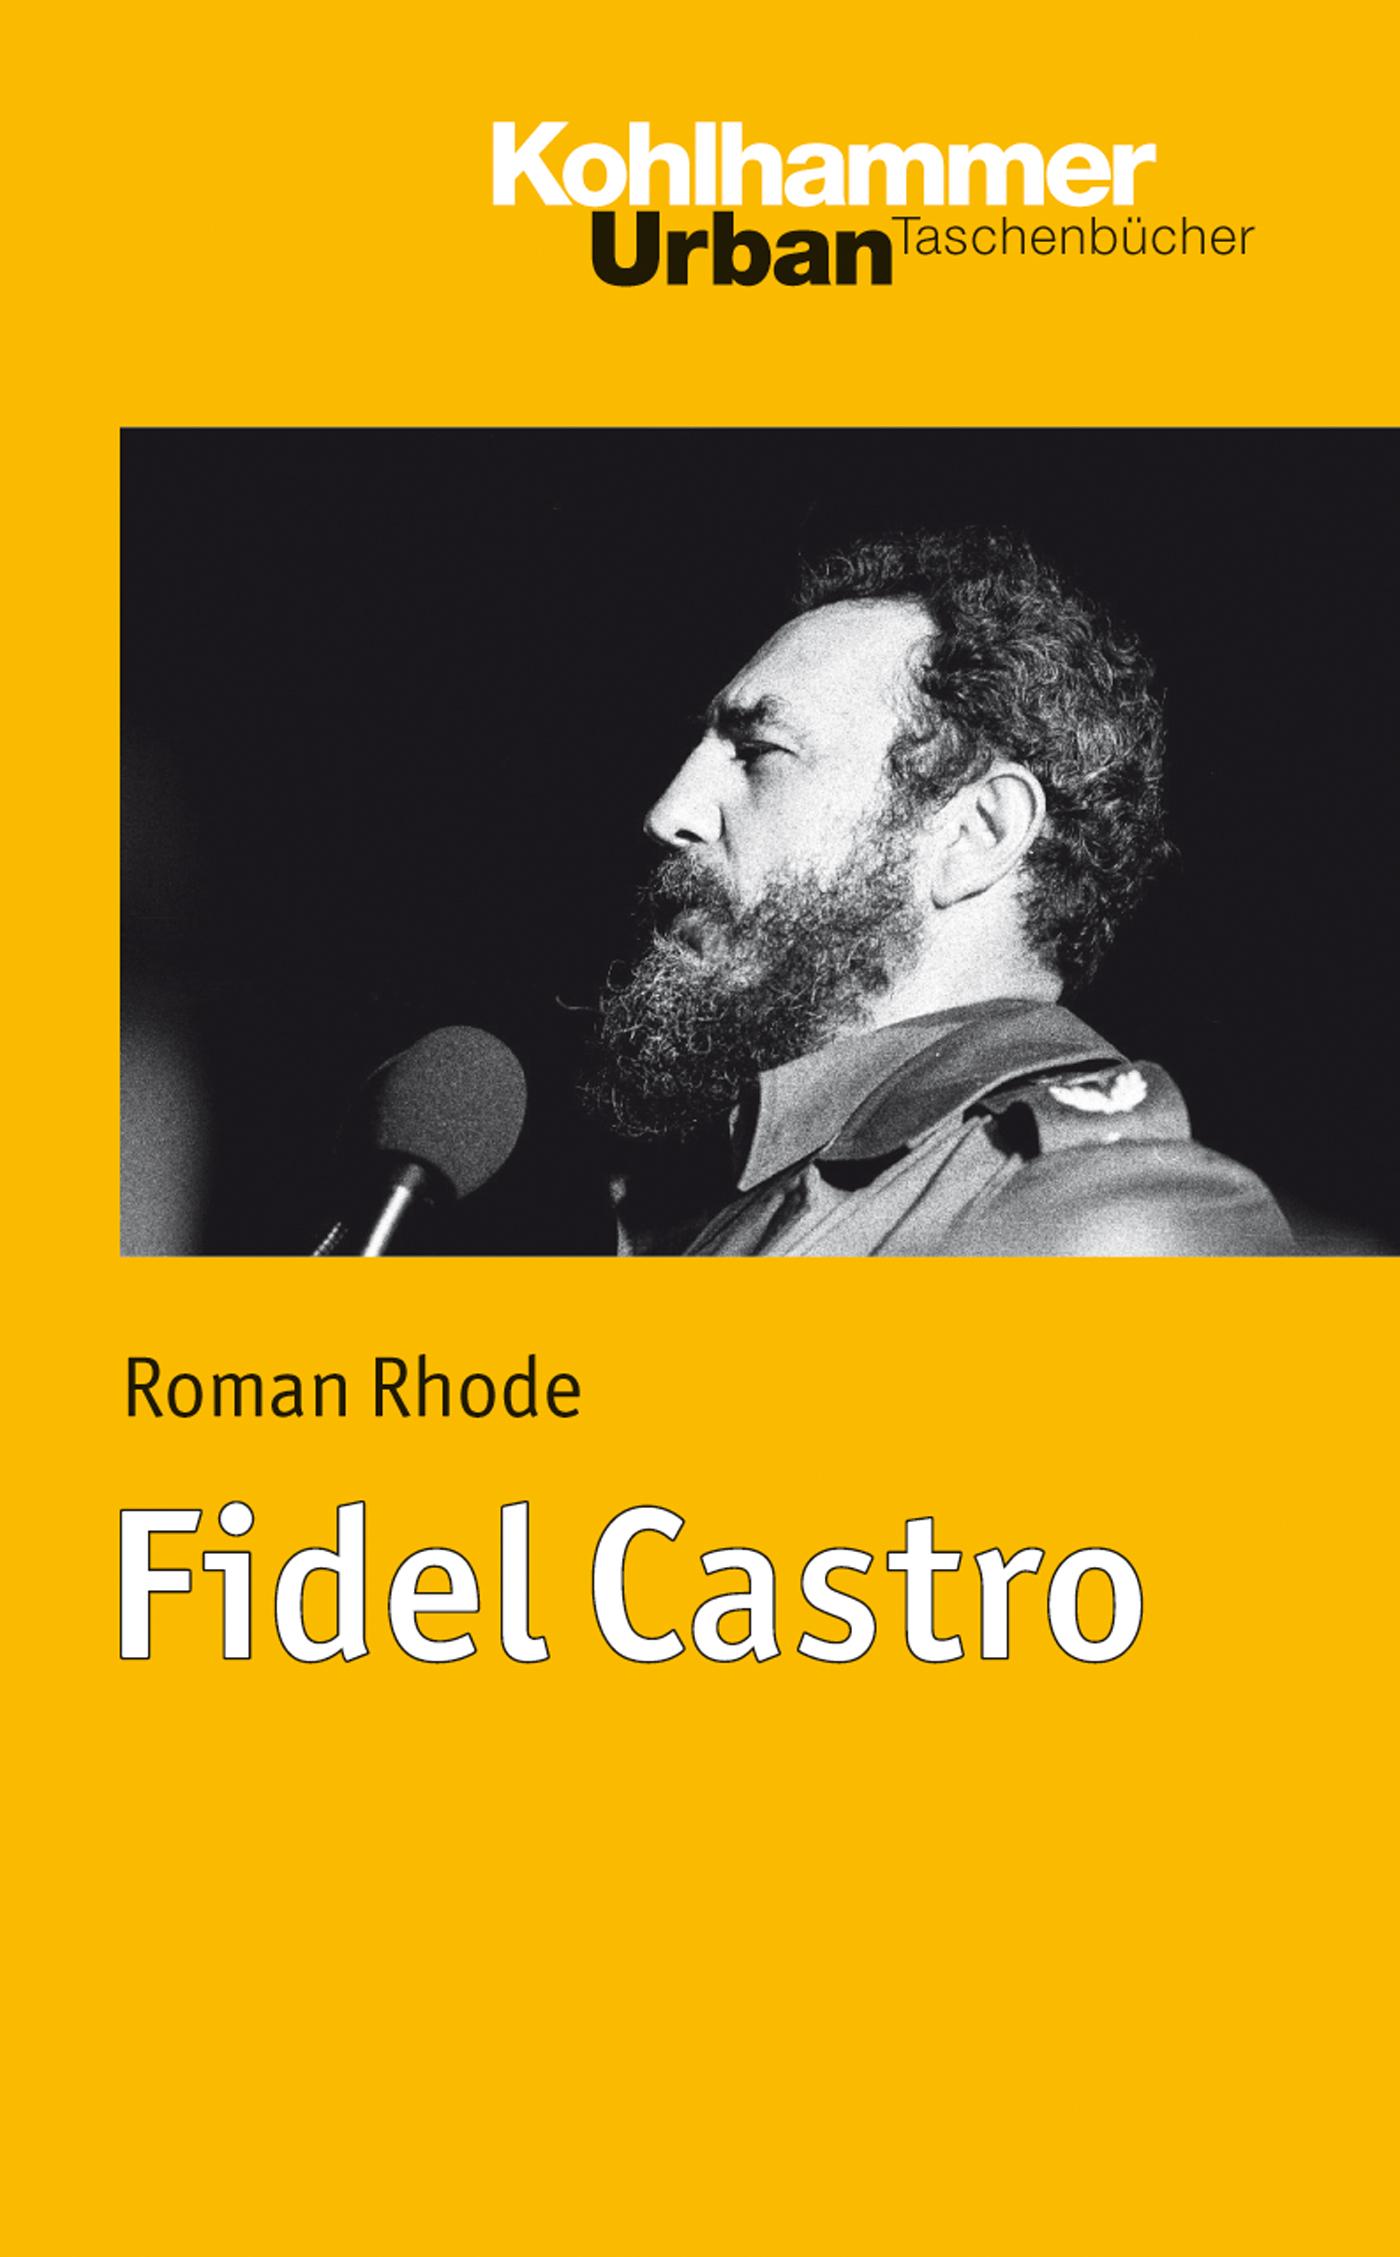 Roman Rhode Fidel Castro rhode island drug court